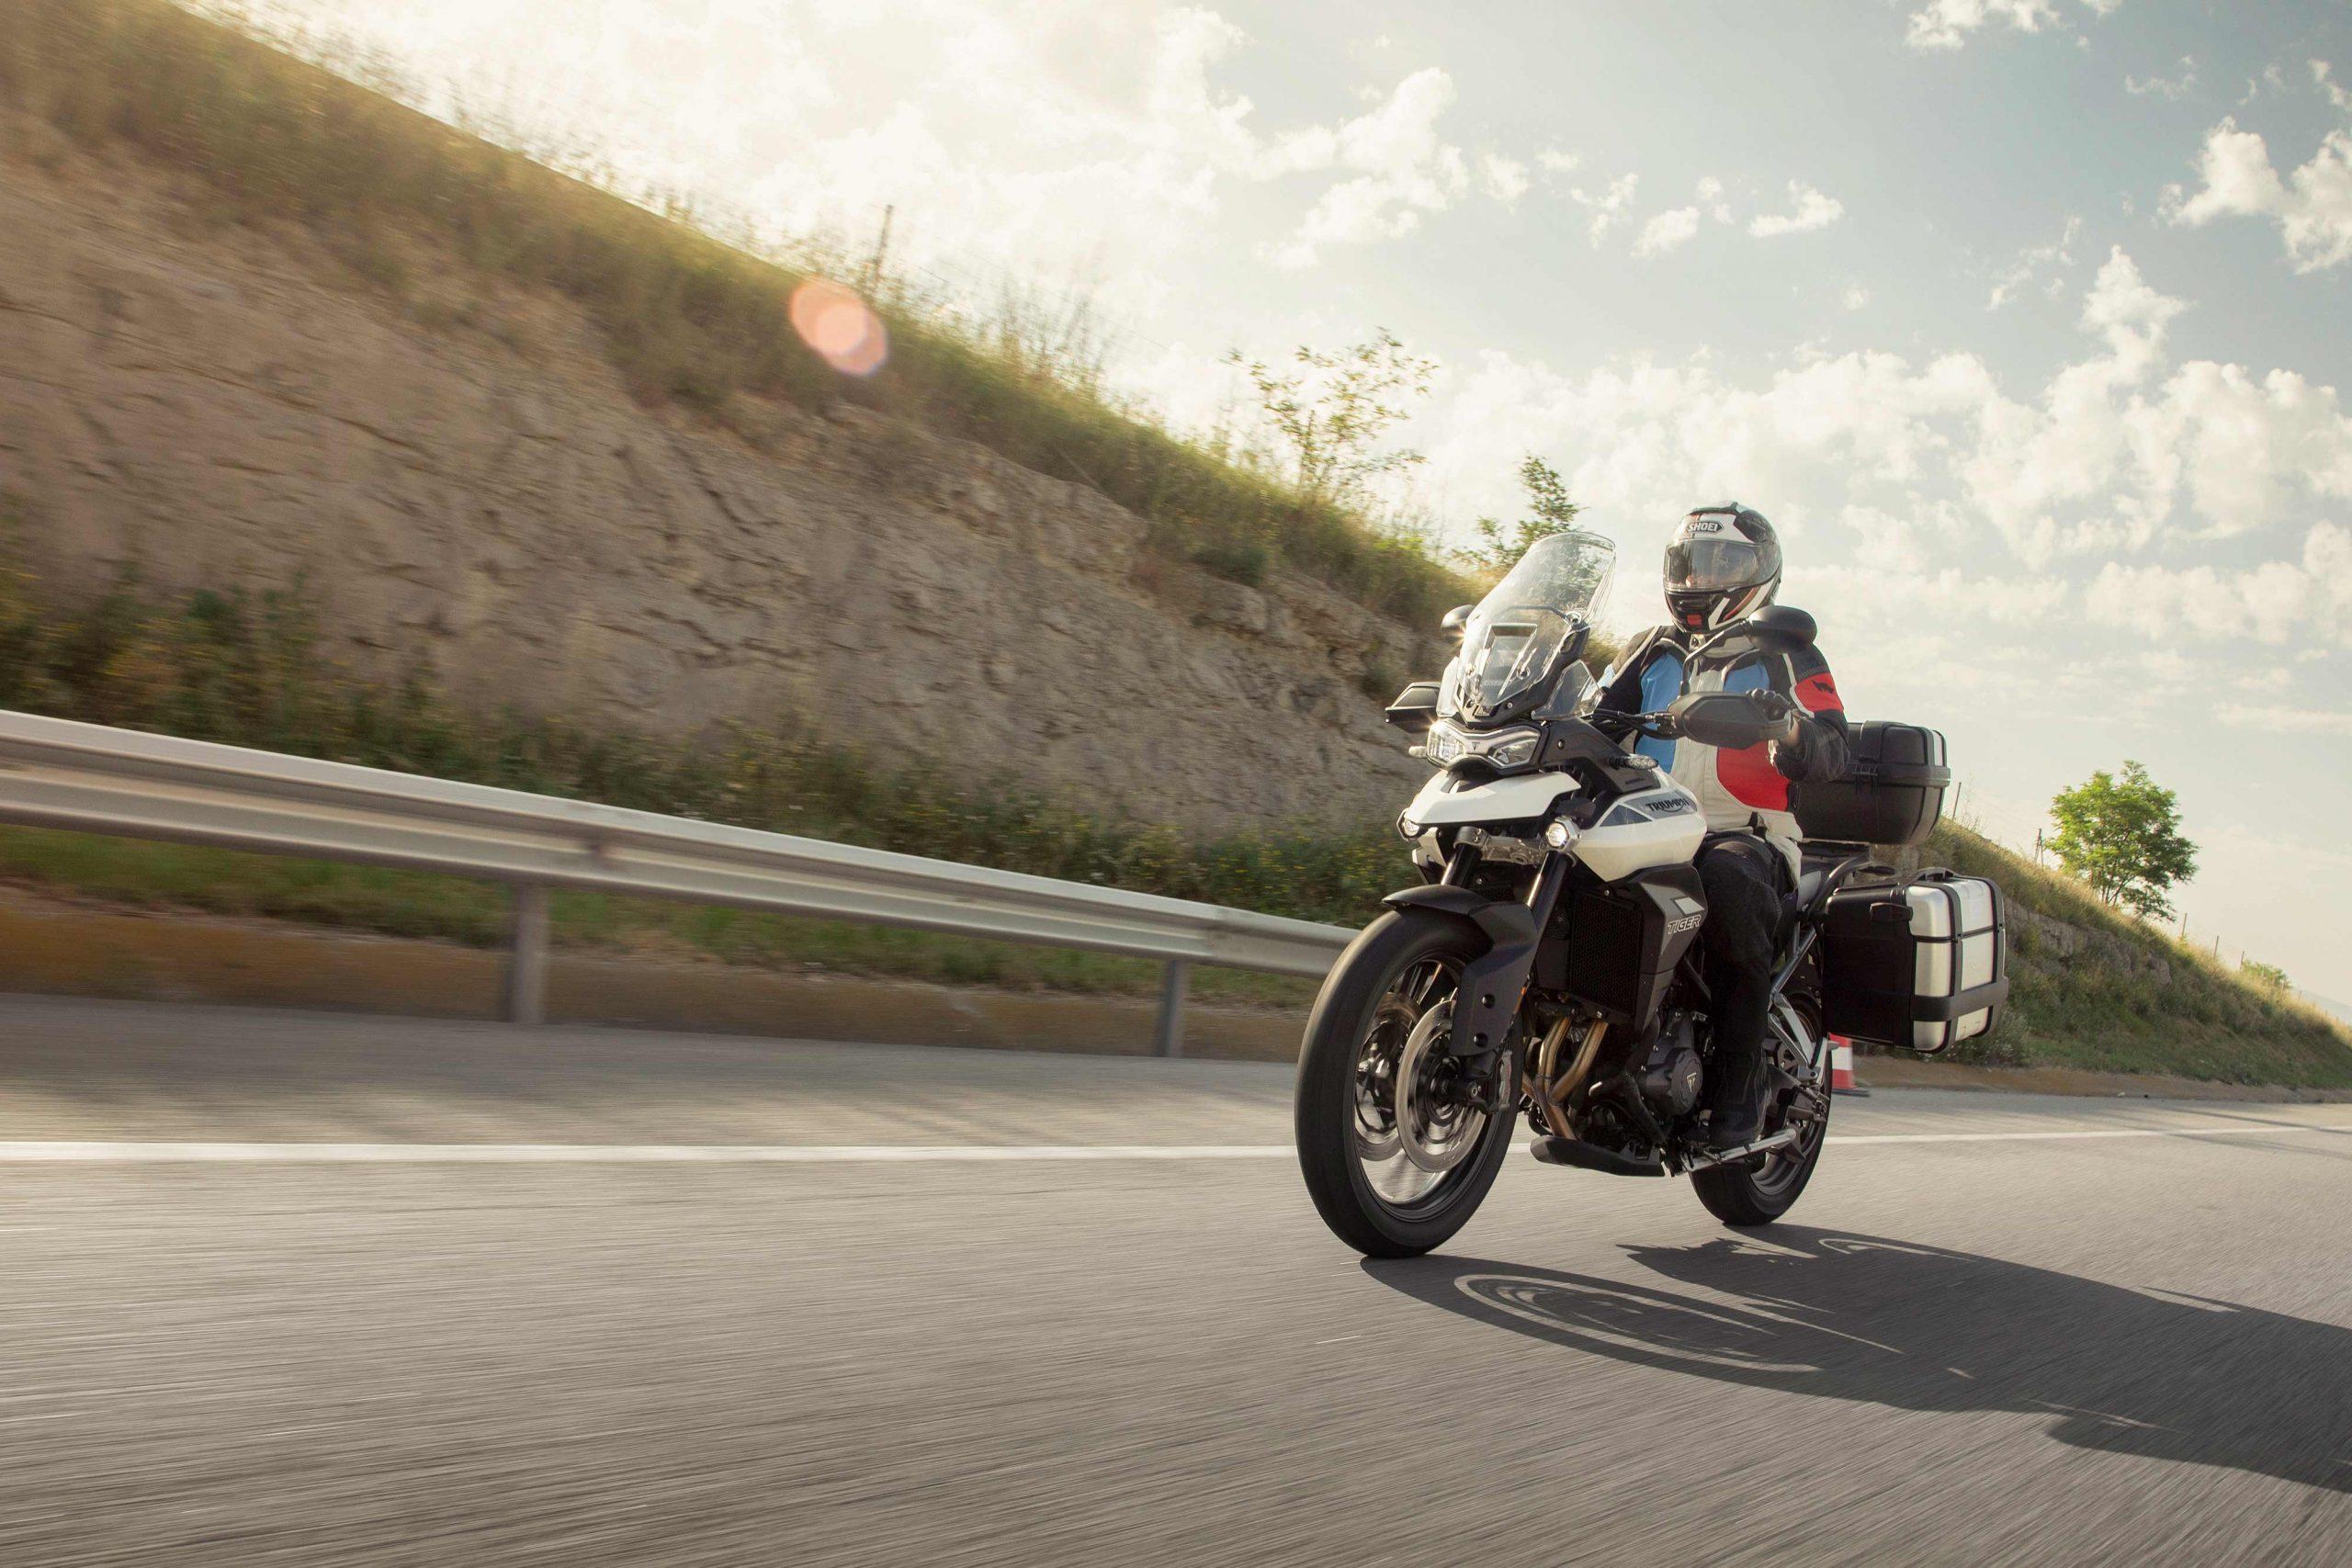 002_TriumphTiger-motosnet-mariapujol-fotografobarcelona